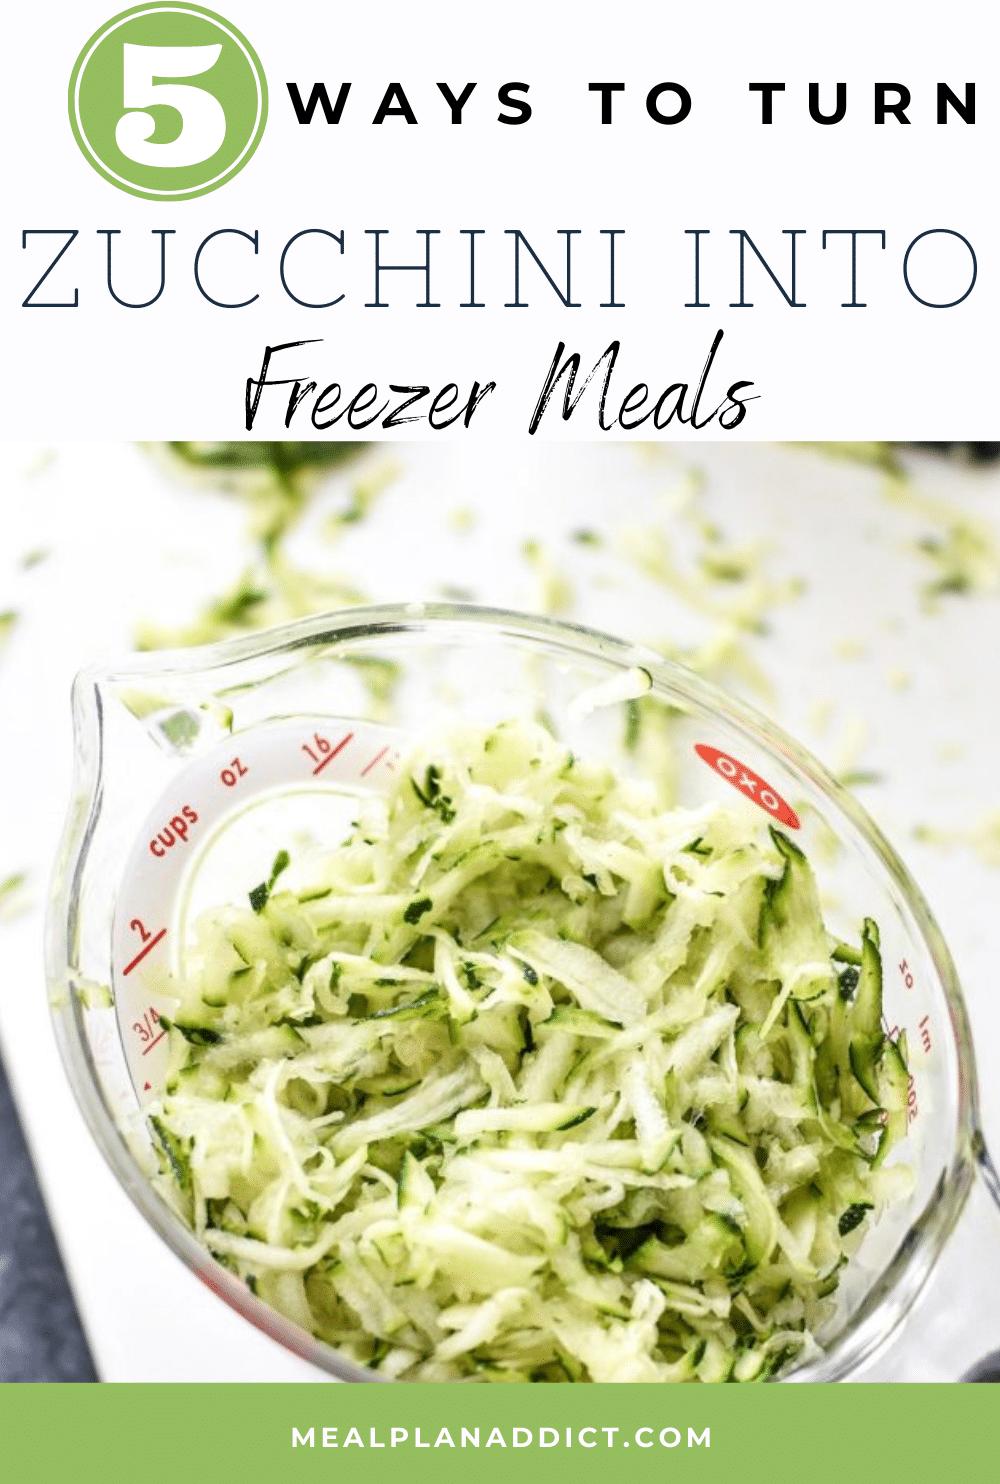 5 Ways to Turn Zucchini into Freezer Meals | Meal Plan Addict